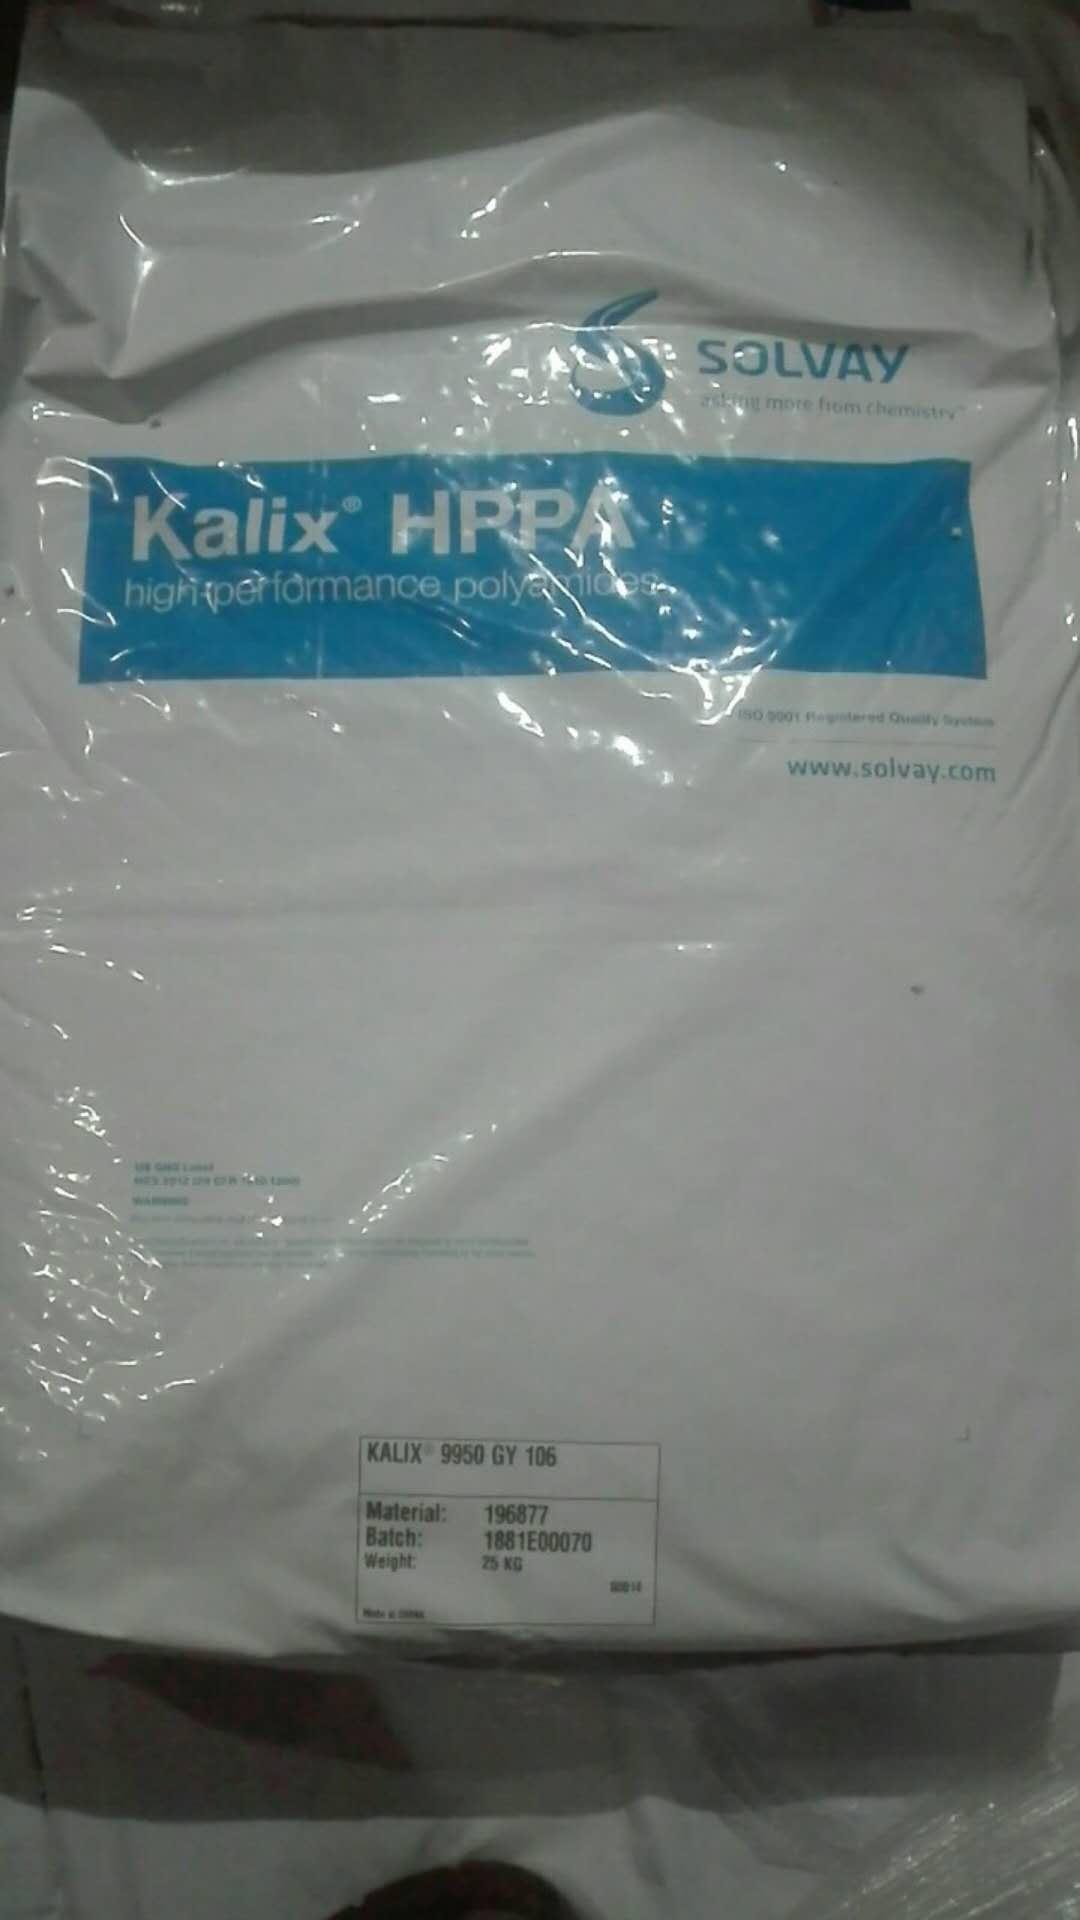 KALIX HPPA 9950